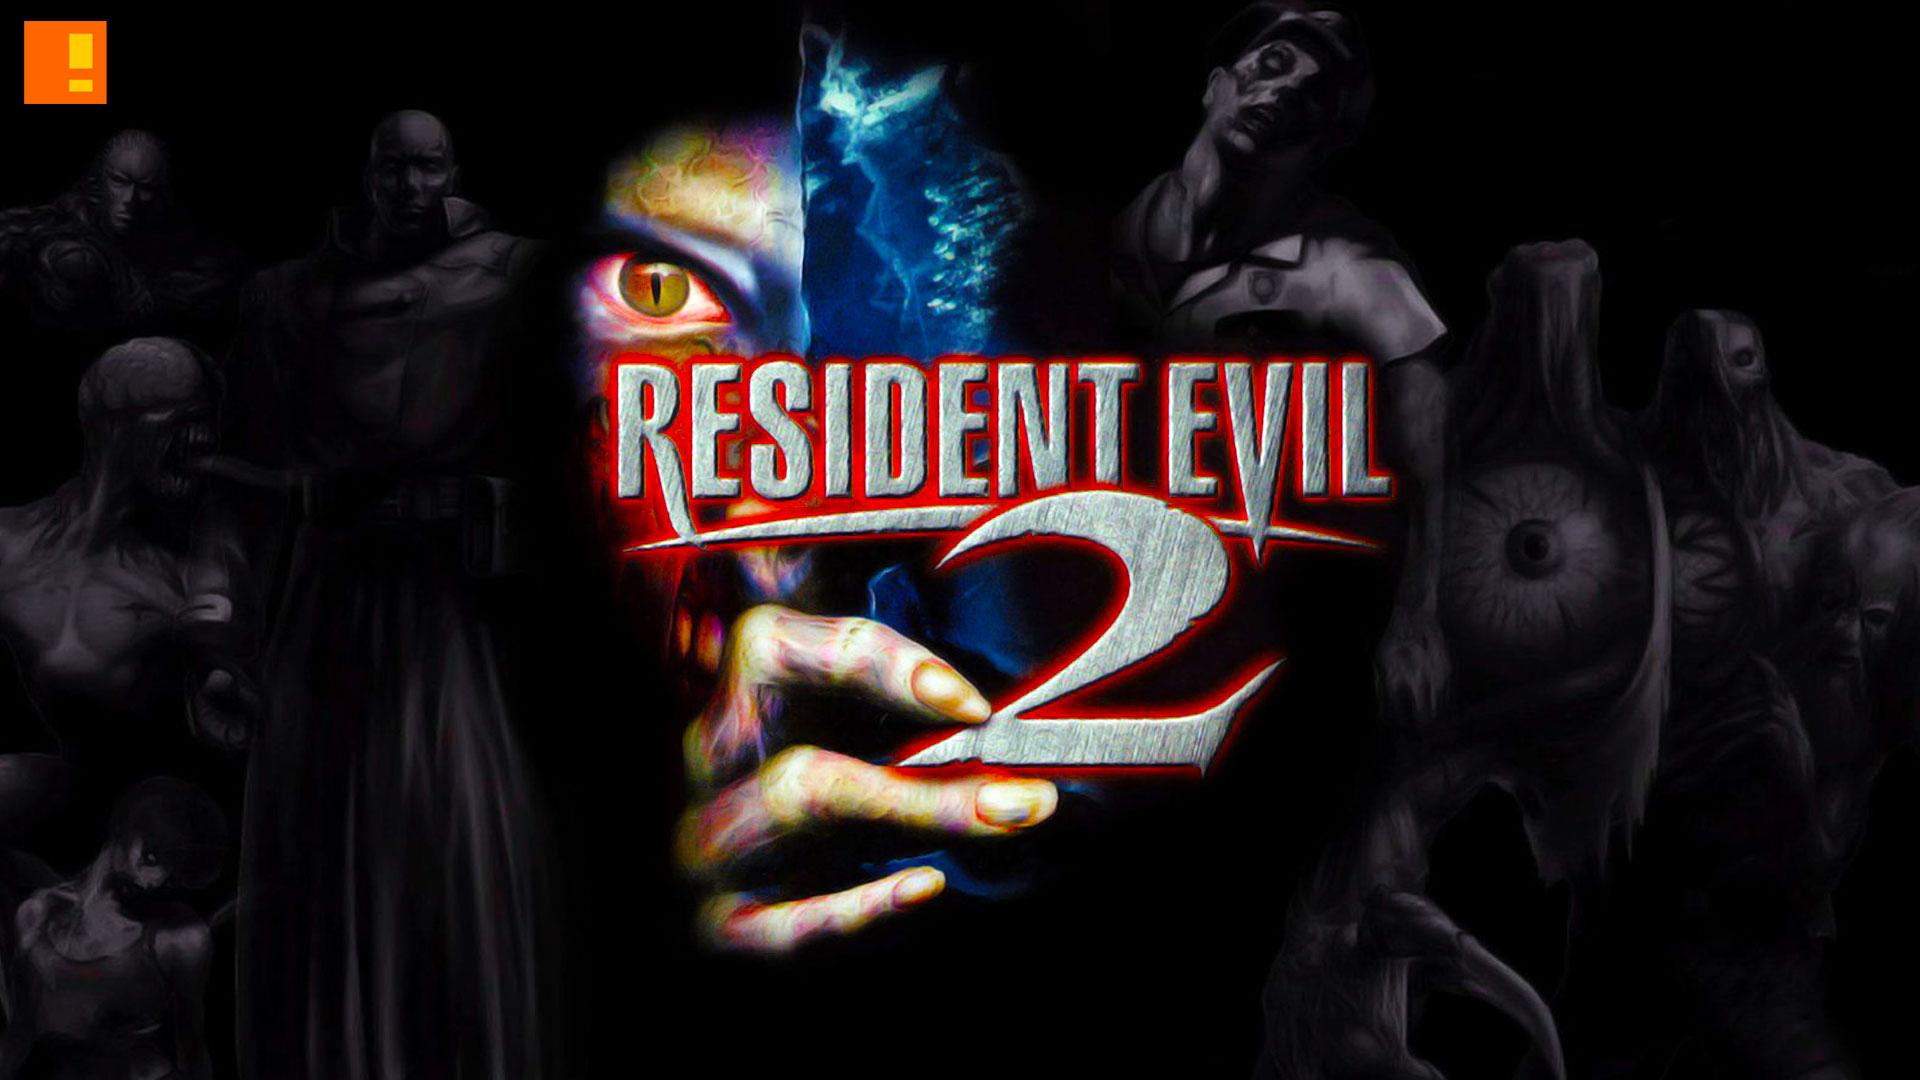 resident evil 2, capcom, the action pixel, entertainment on tap, capcom,